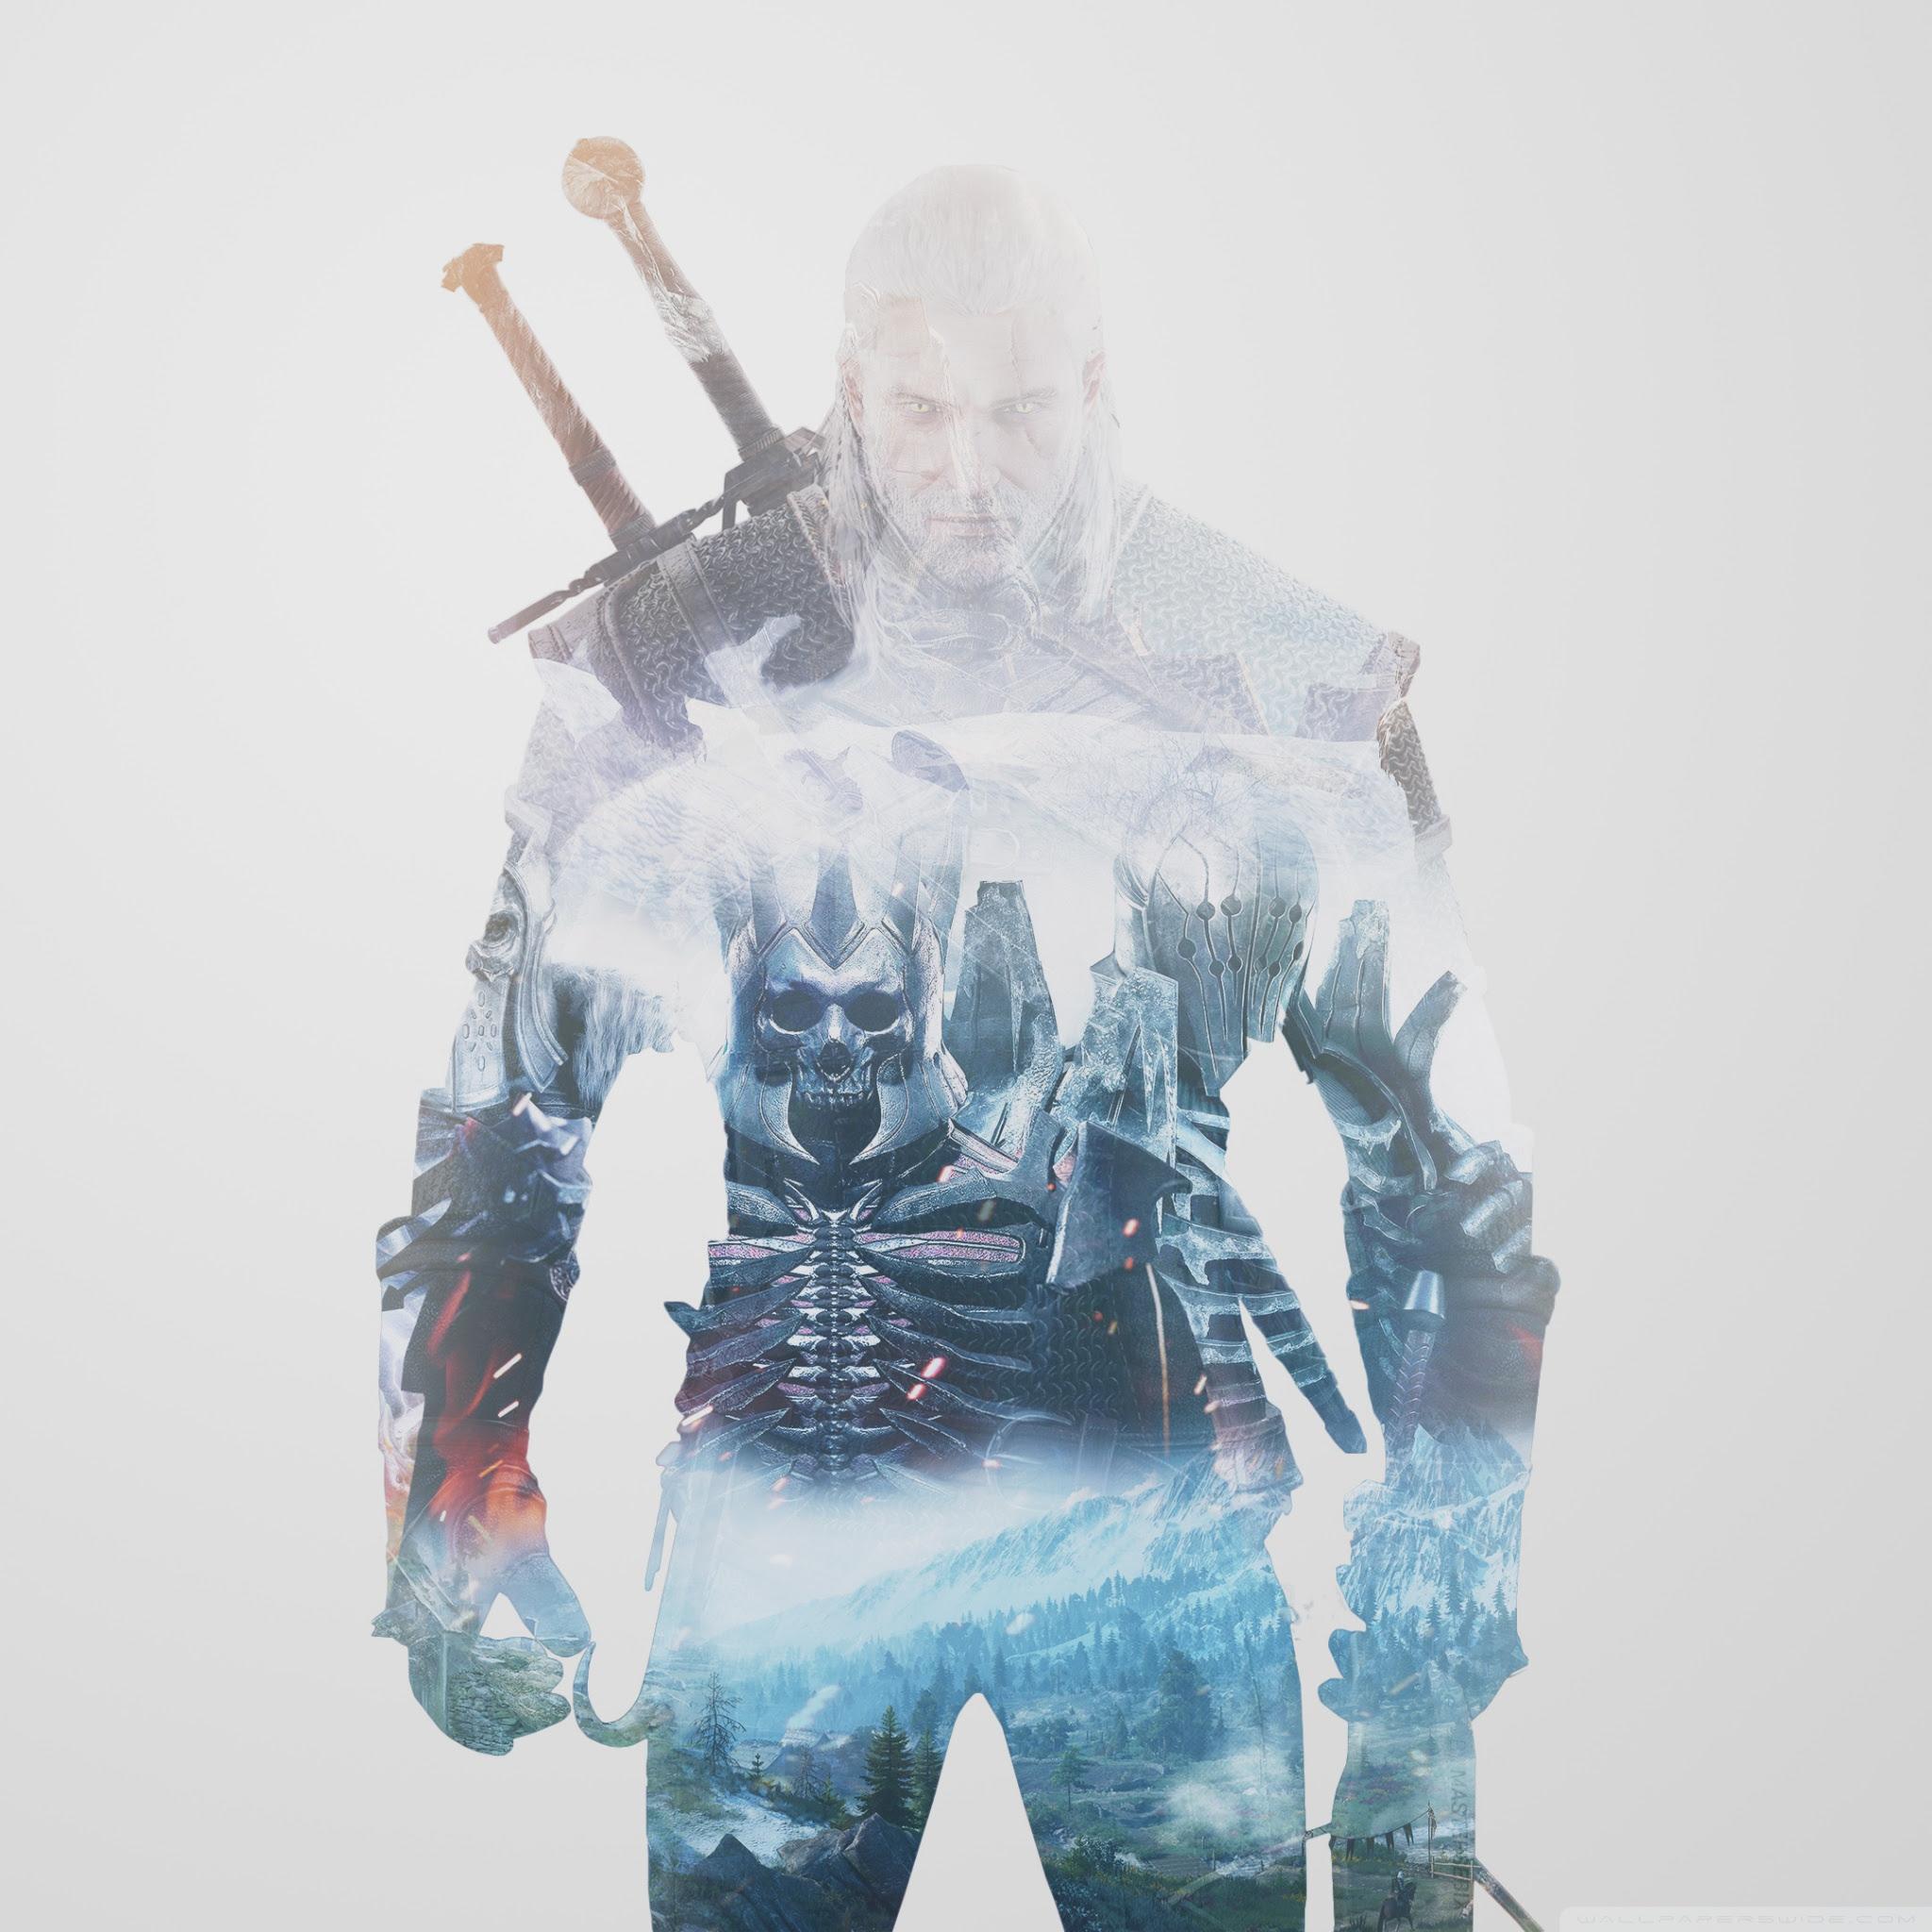 Witcher 3 Wild Hunt Uhd Desktop Wallpaper For 4k Ultra Hd